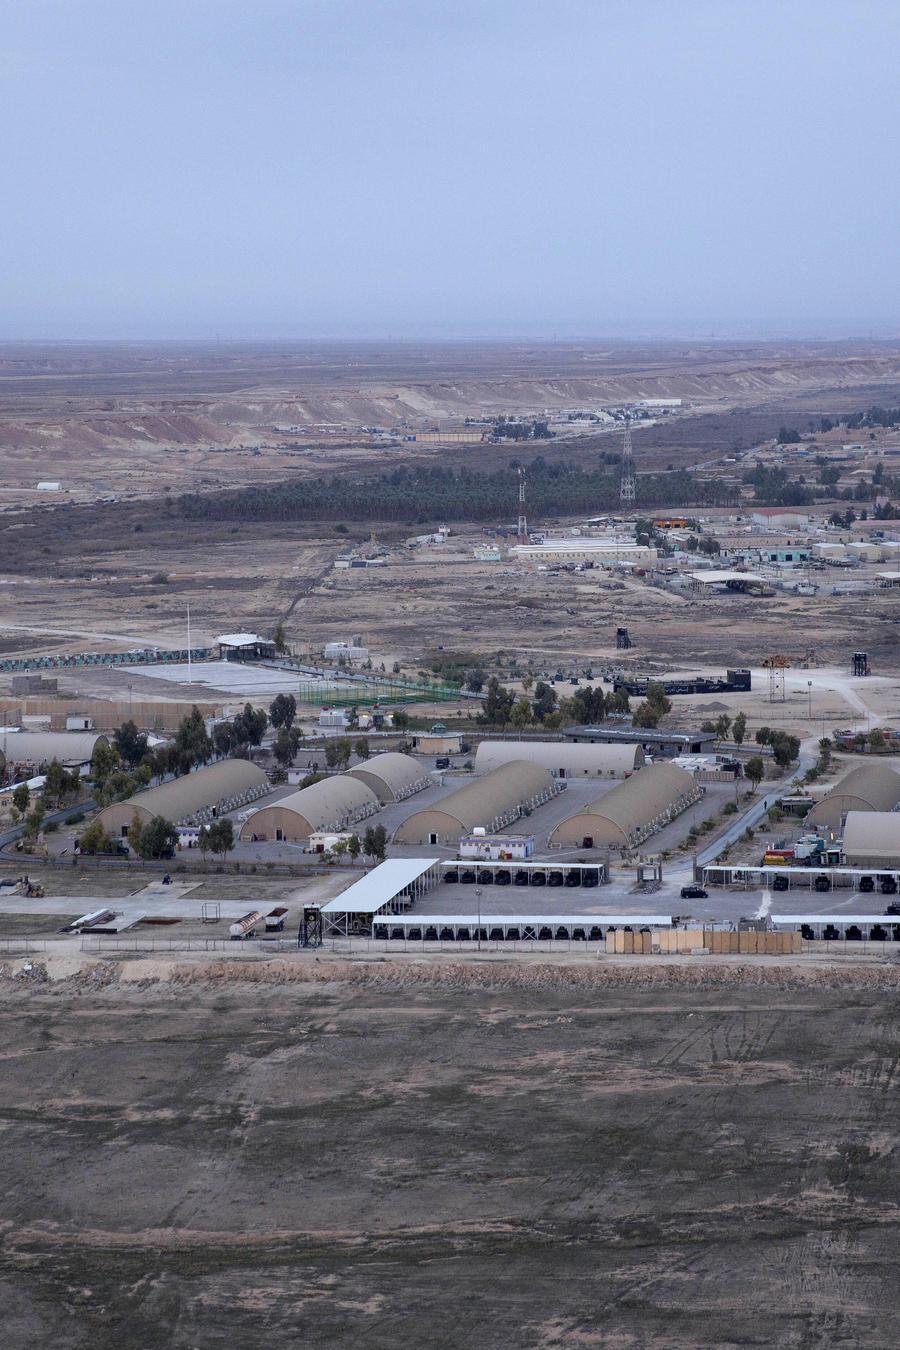 Base aérea de Ain al-Asad en el desierto occidental de Anbar, Iraq.